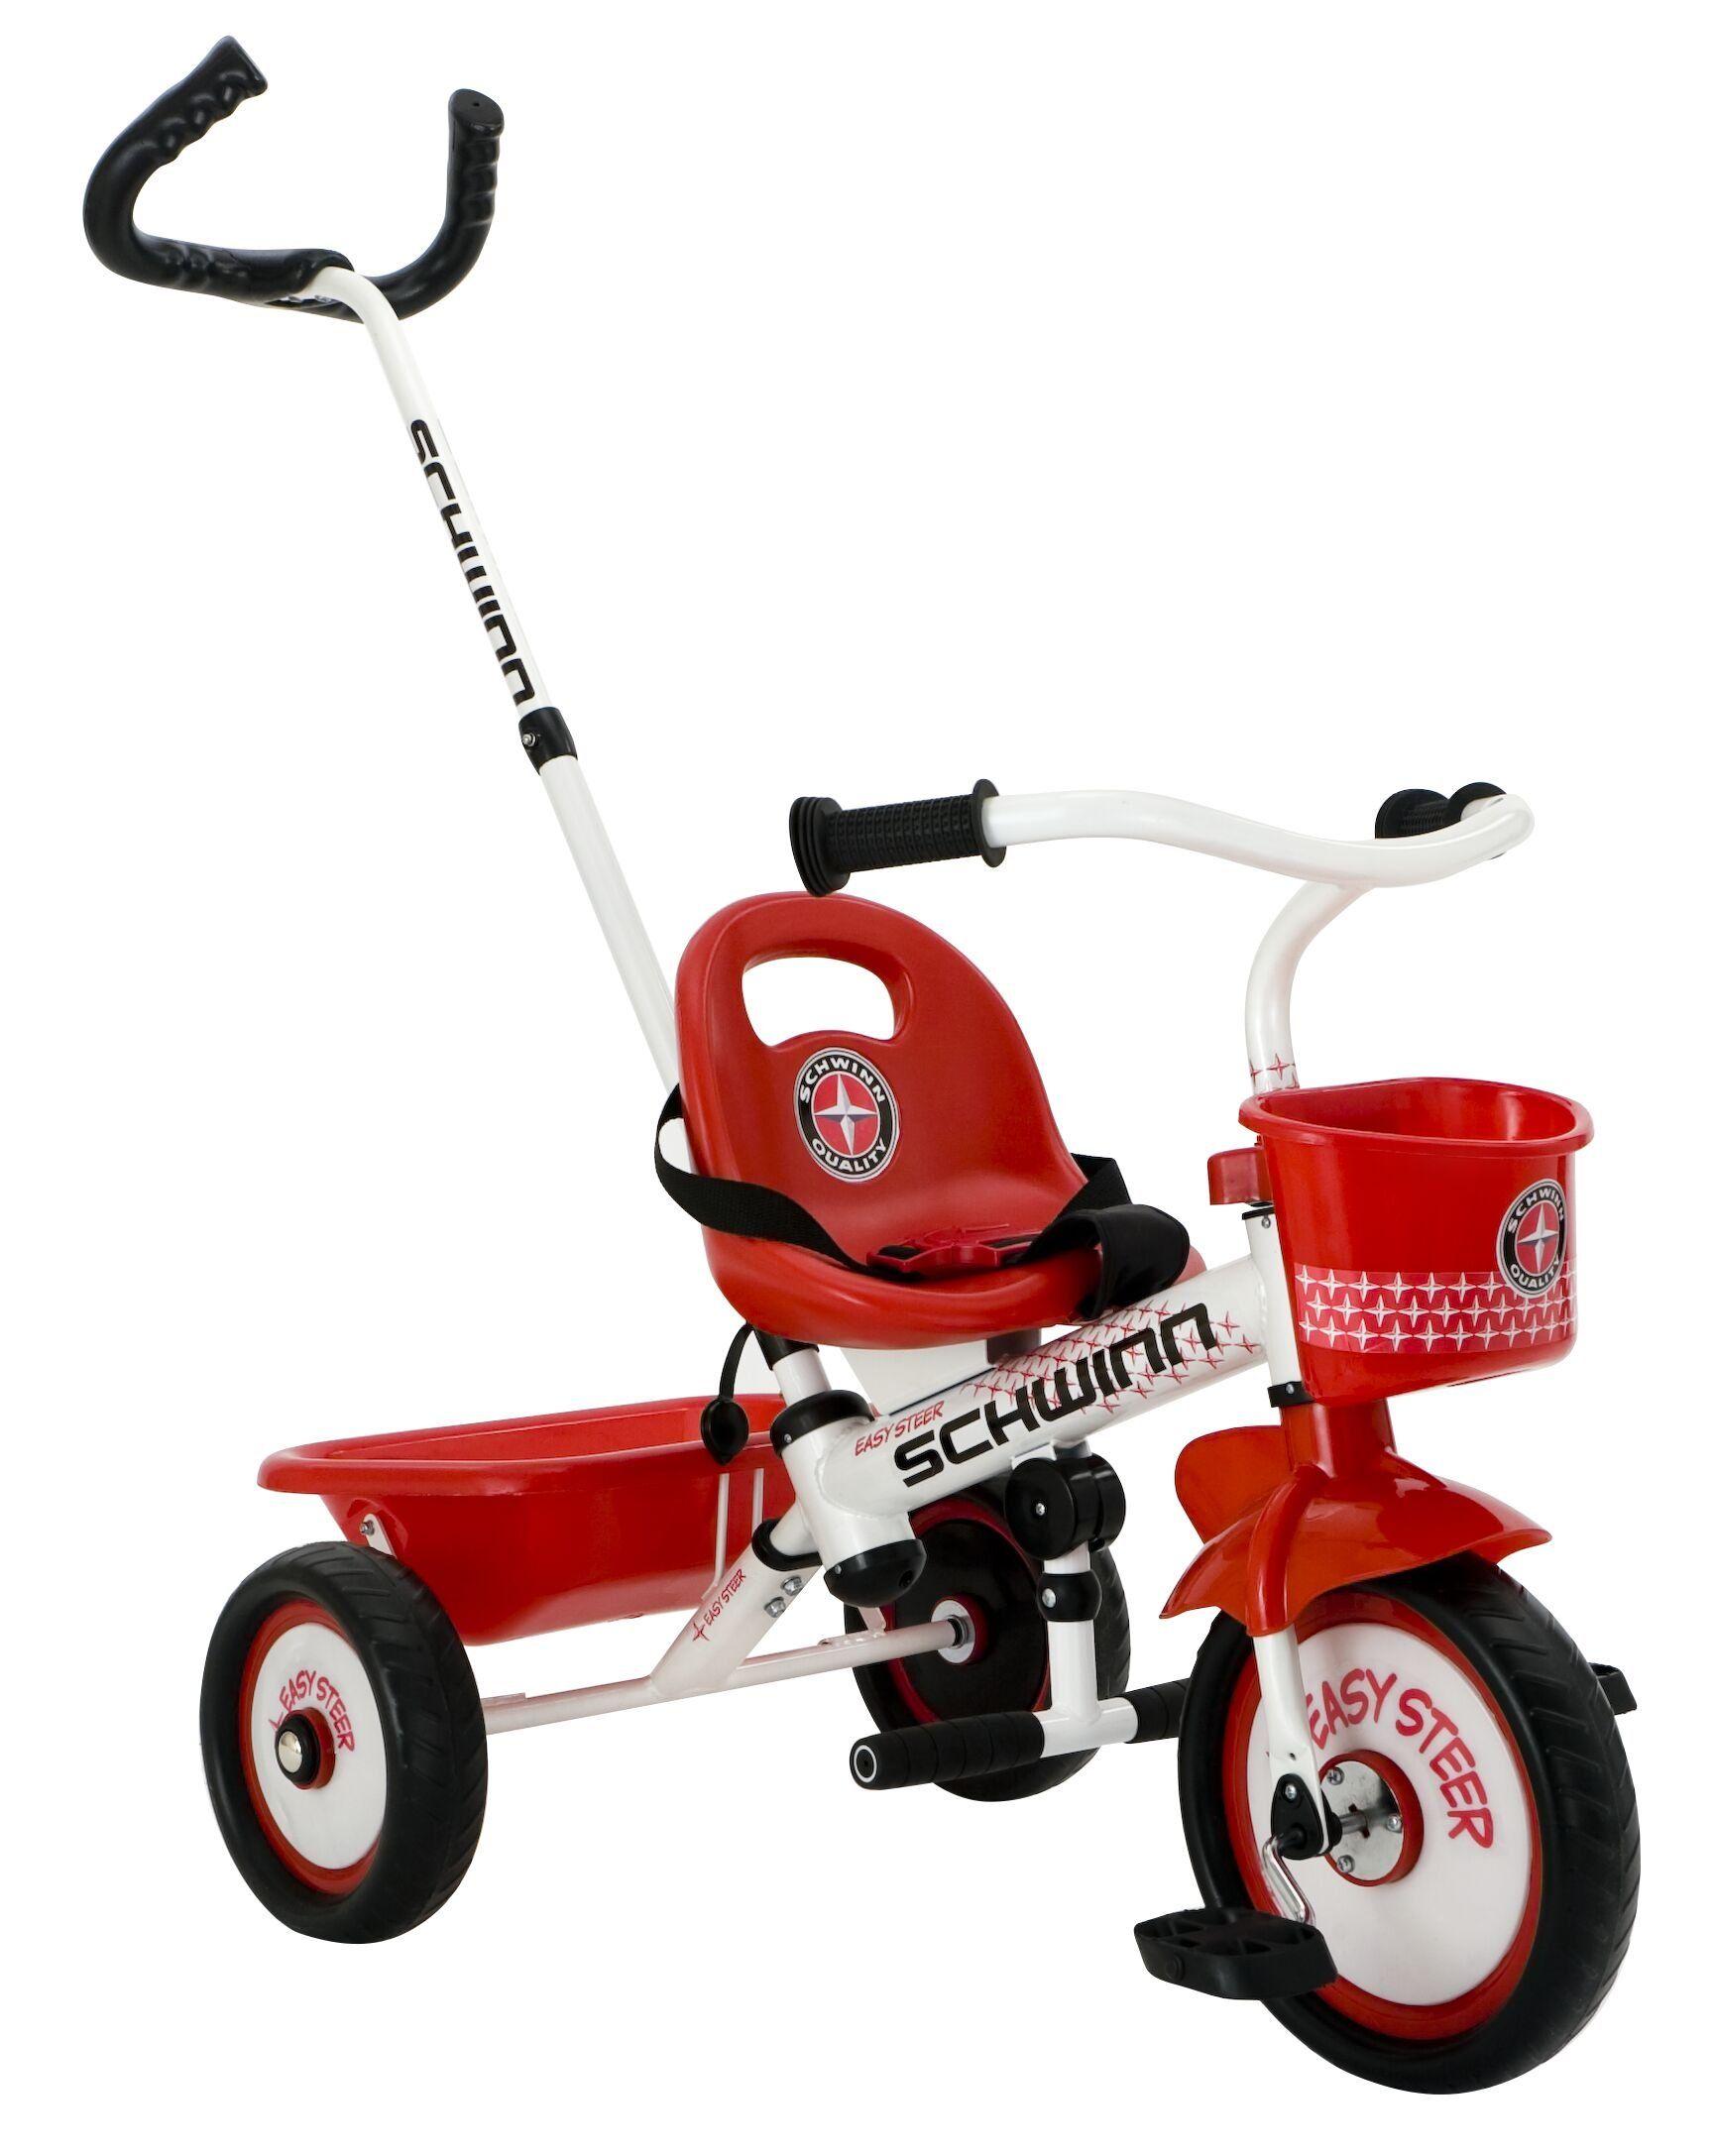 Schwinn Easy Steer Tricycle, Red/White Baby bicycle